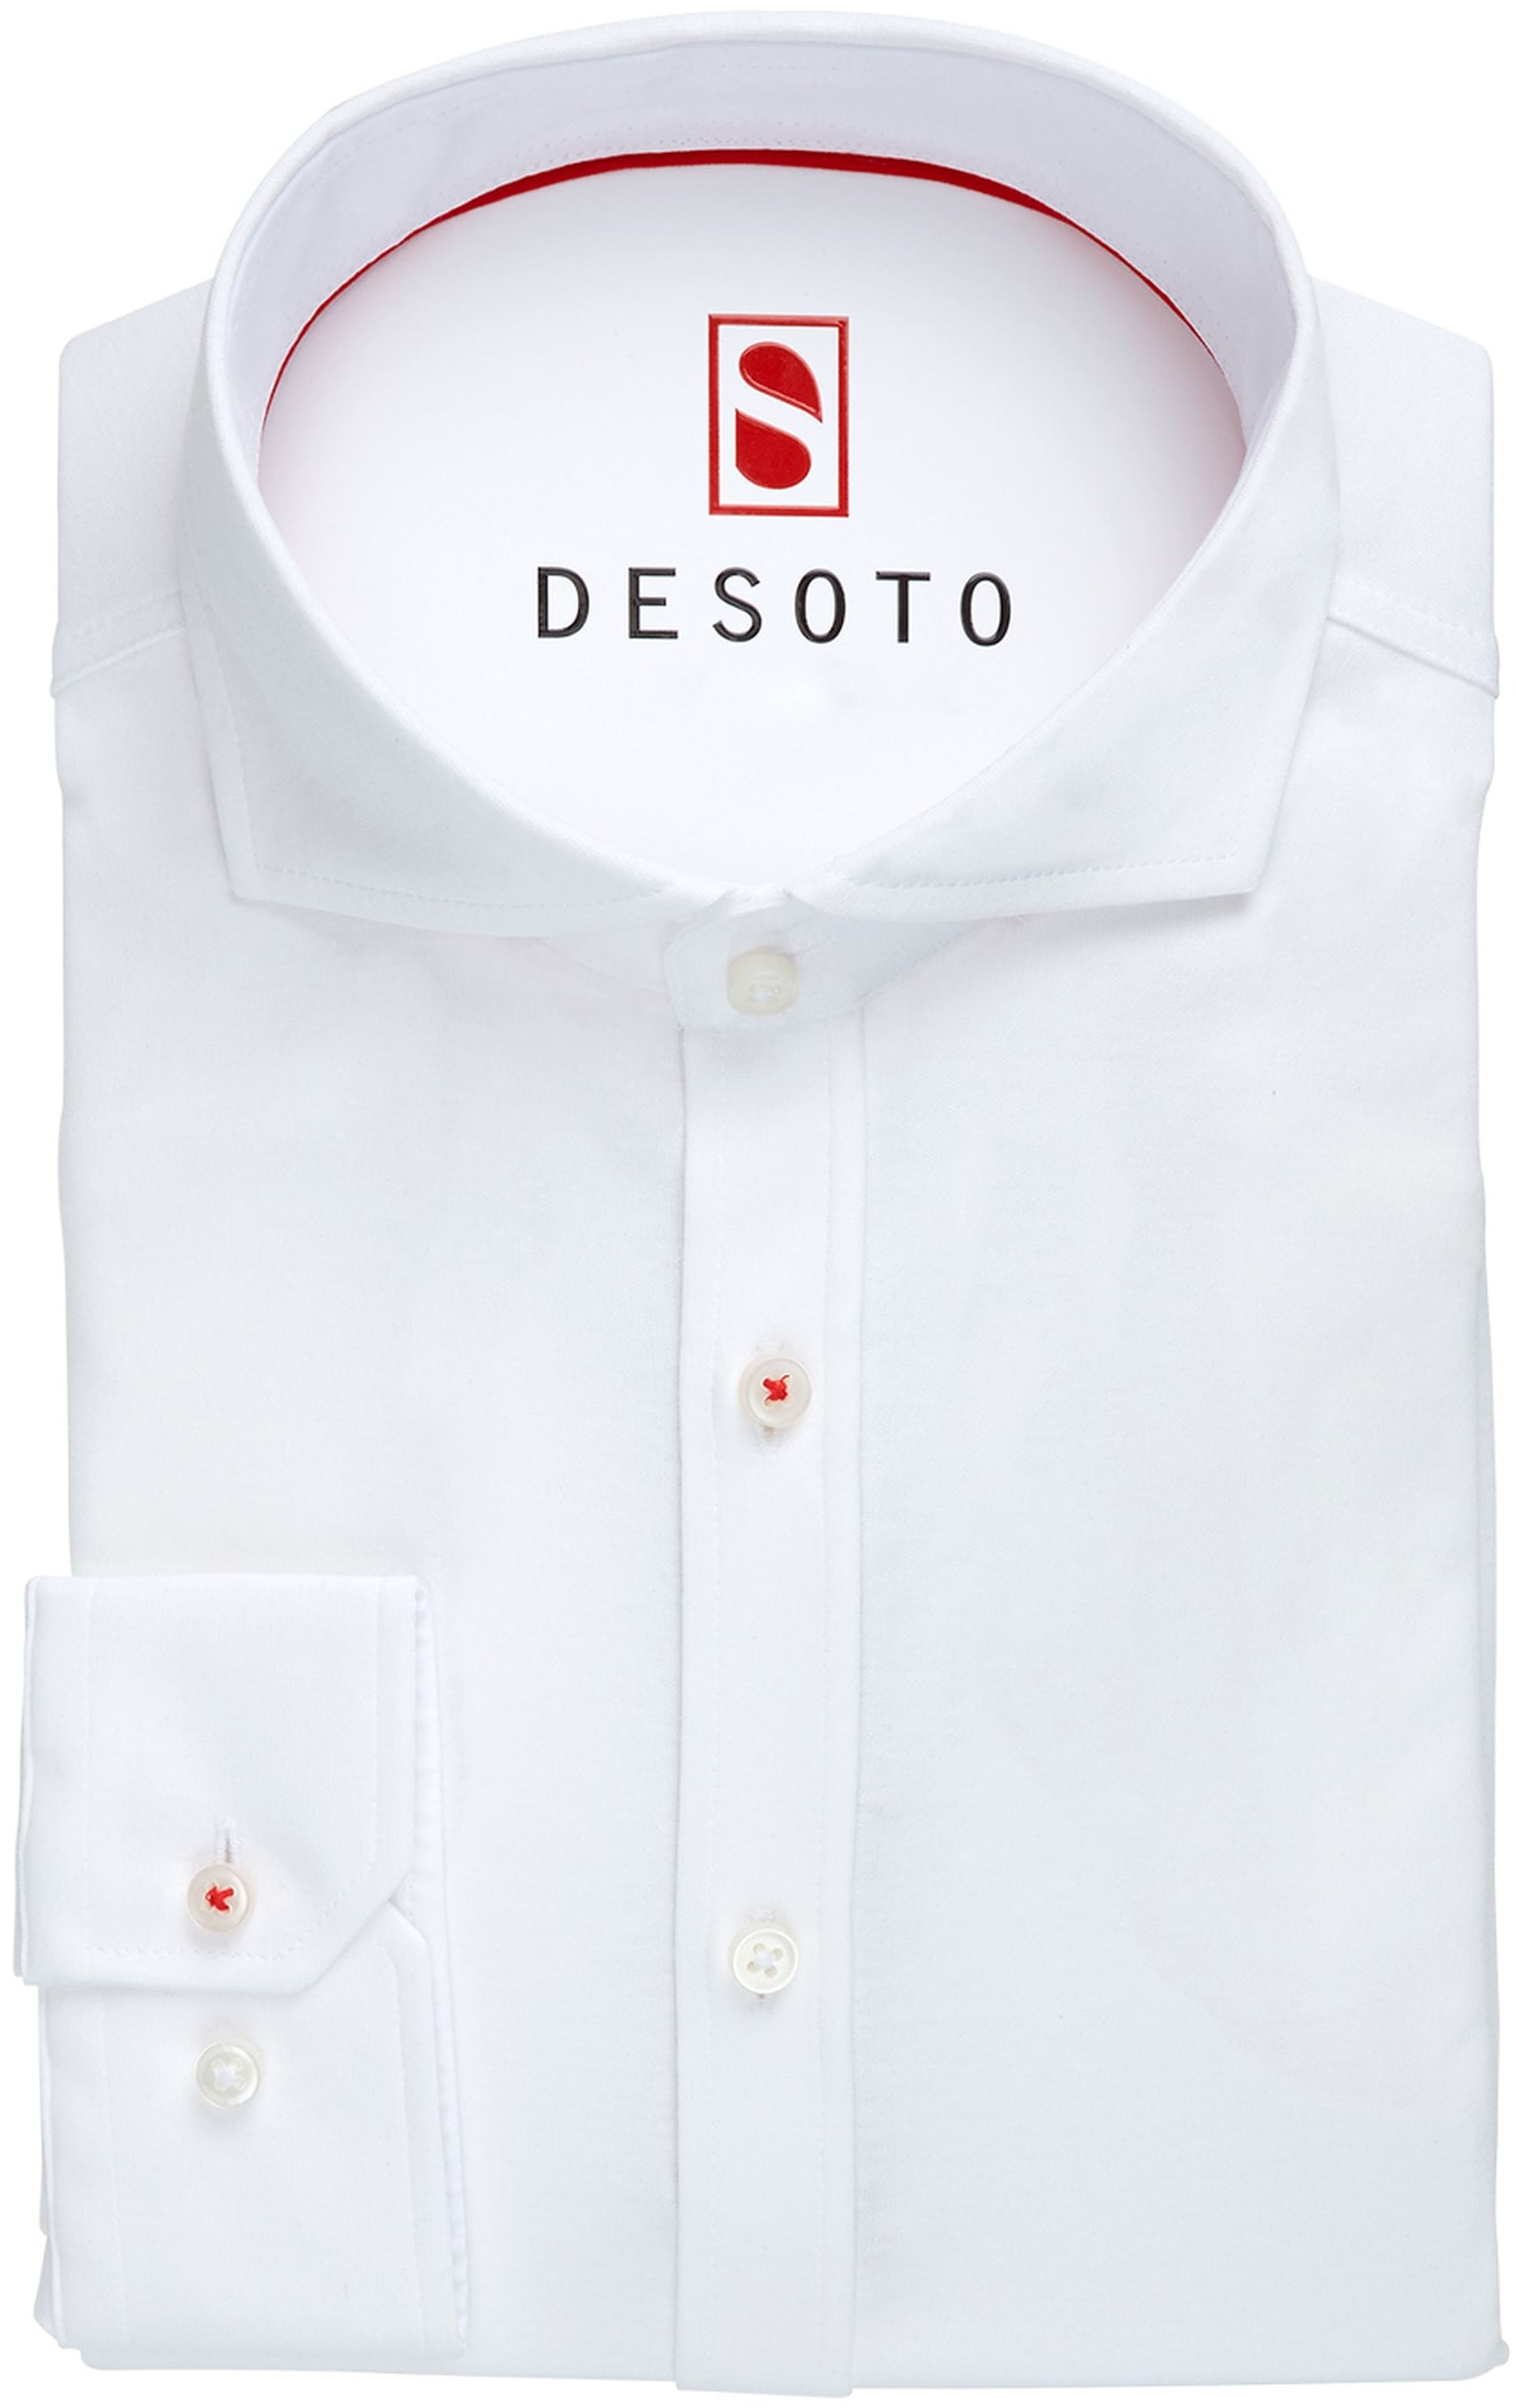 Desoto Overhemd Strijkvrij Wit foto 2